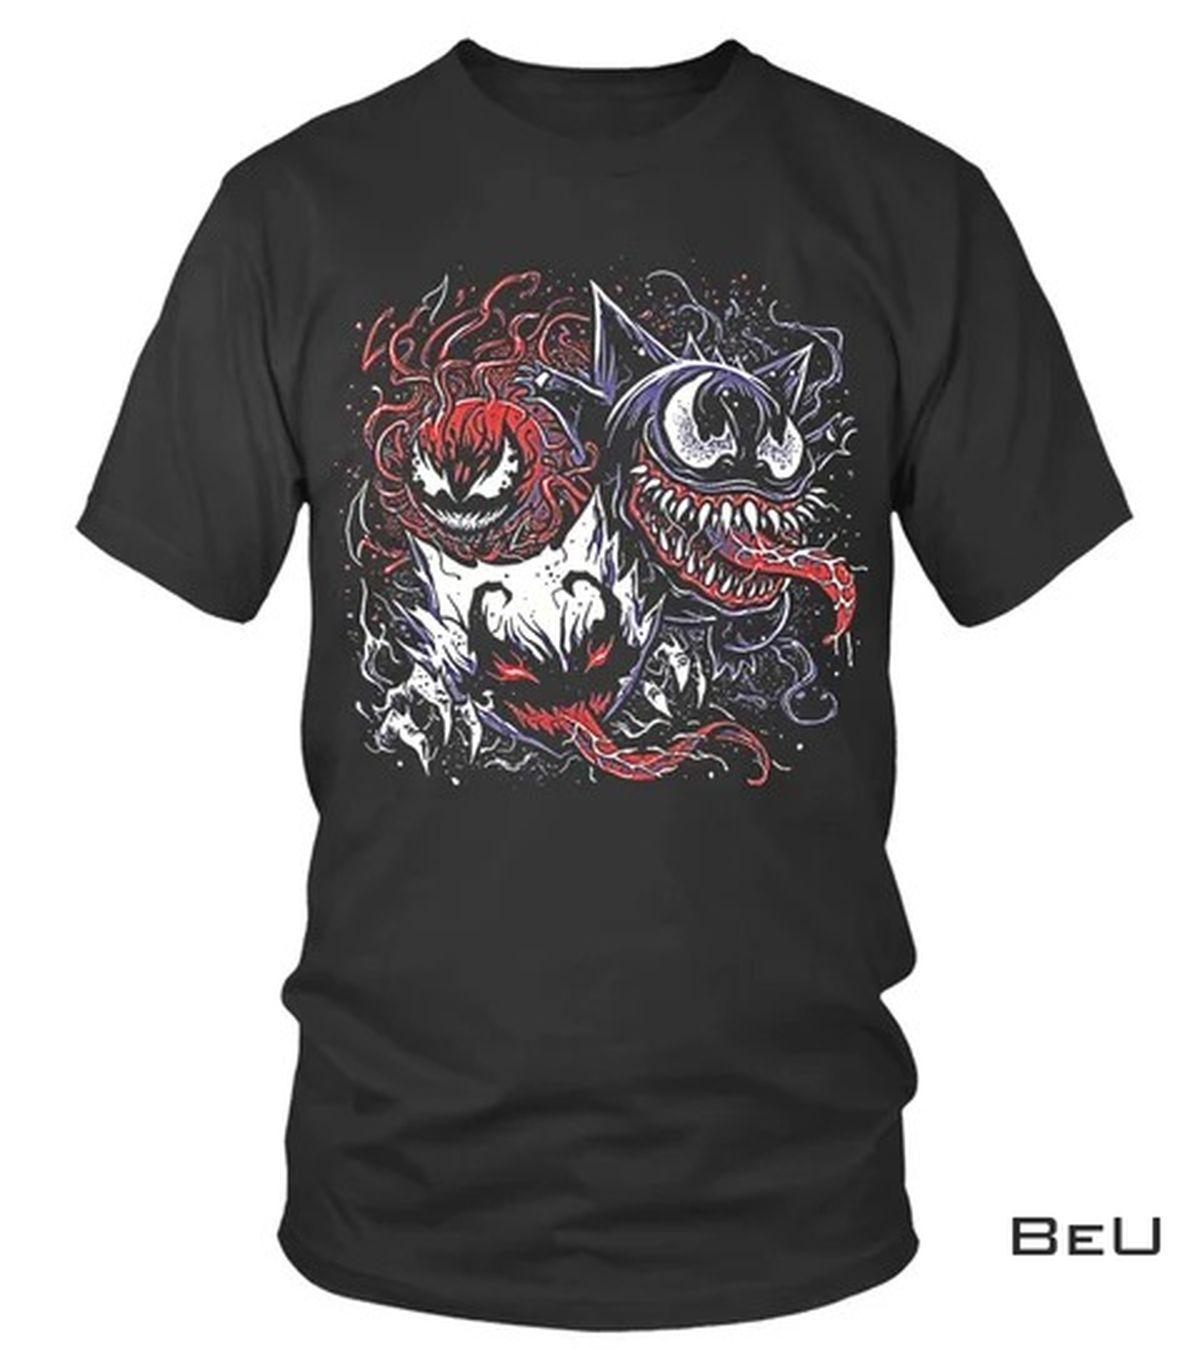 Sale Off Venom Gengar Pokemon Shirt, hoodie, tank top